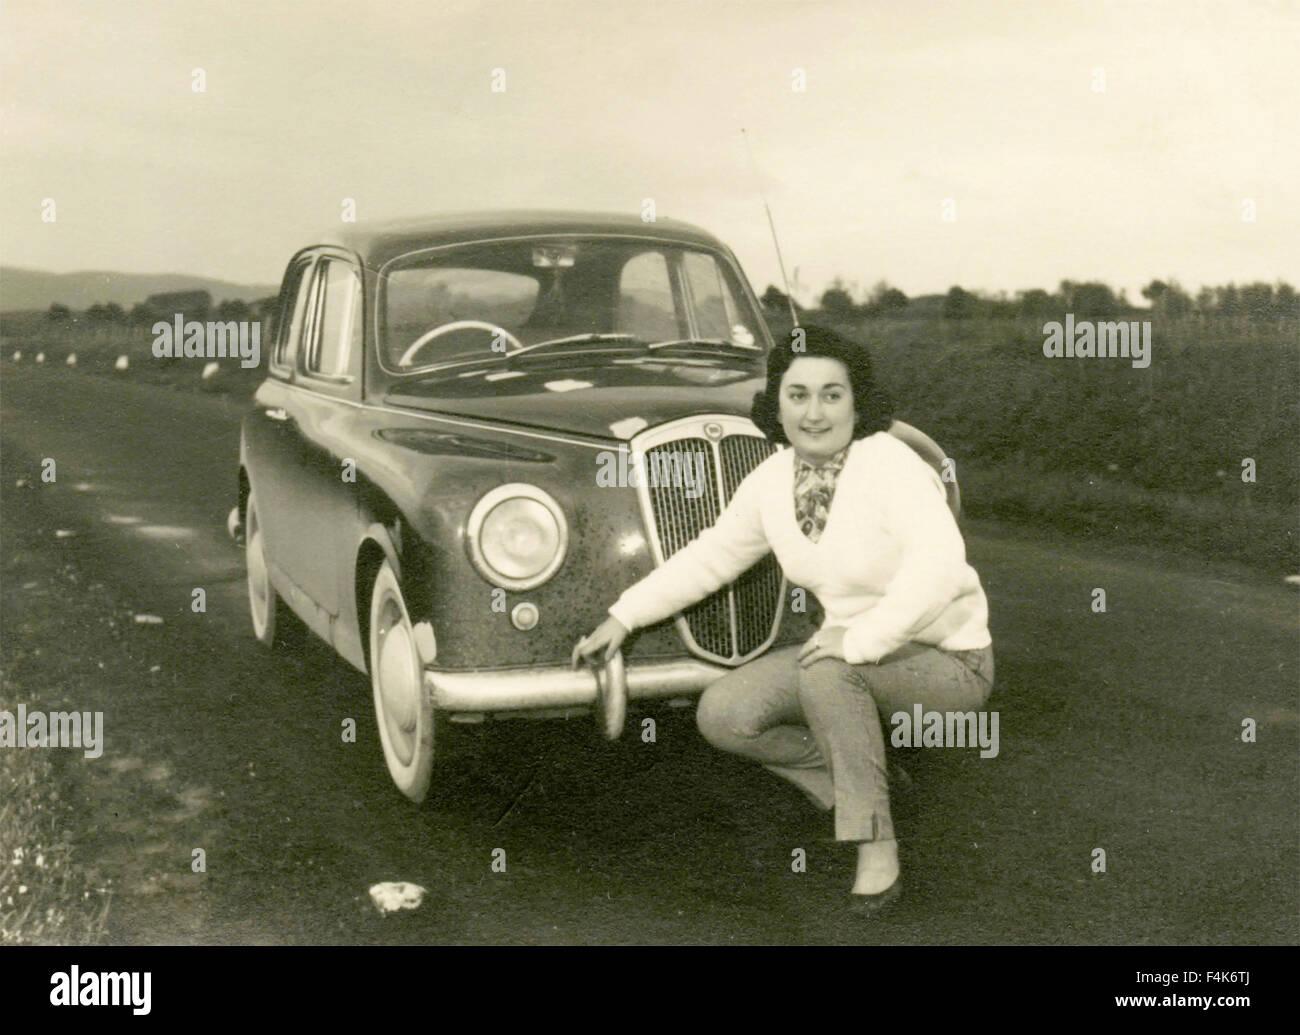 Woman next to a Lancia car, Italy - Stock Image